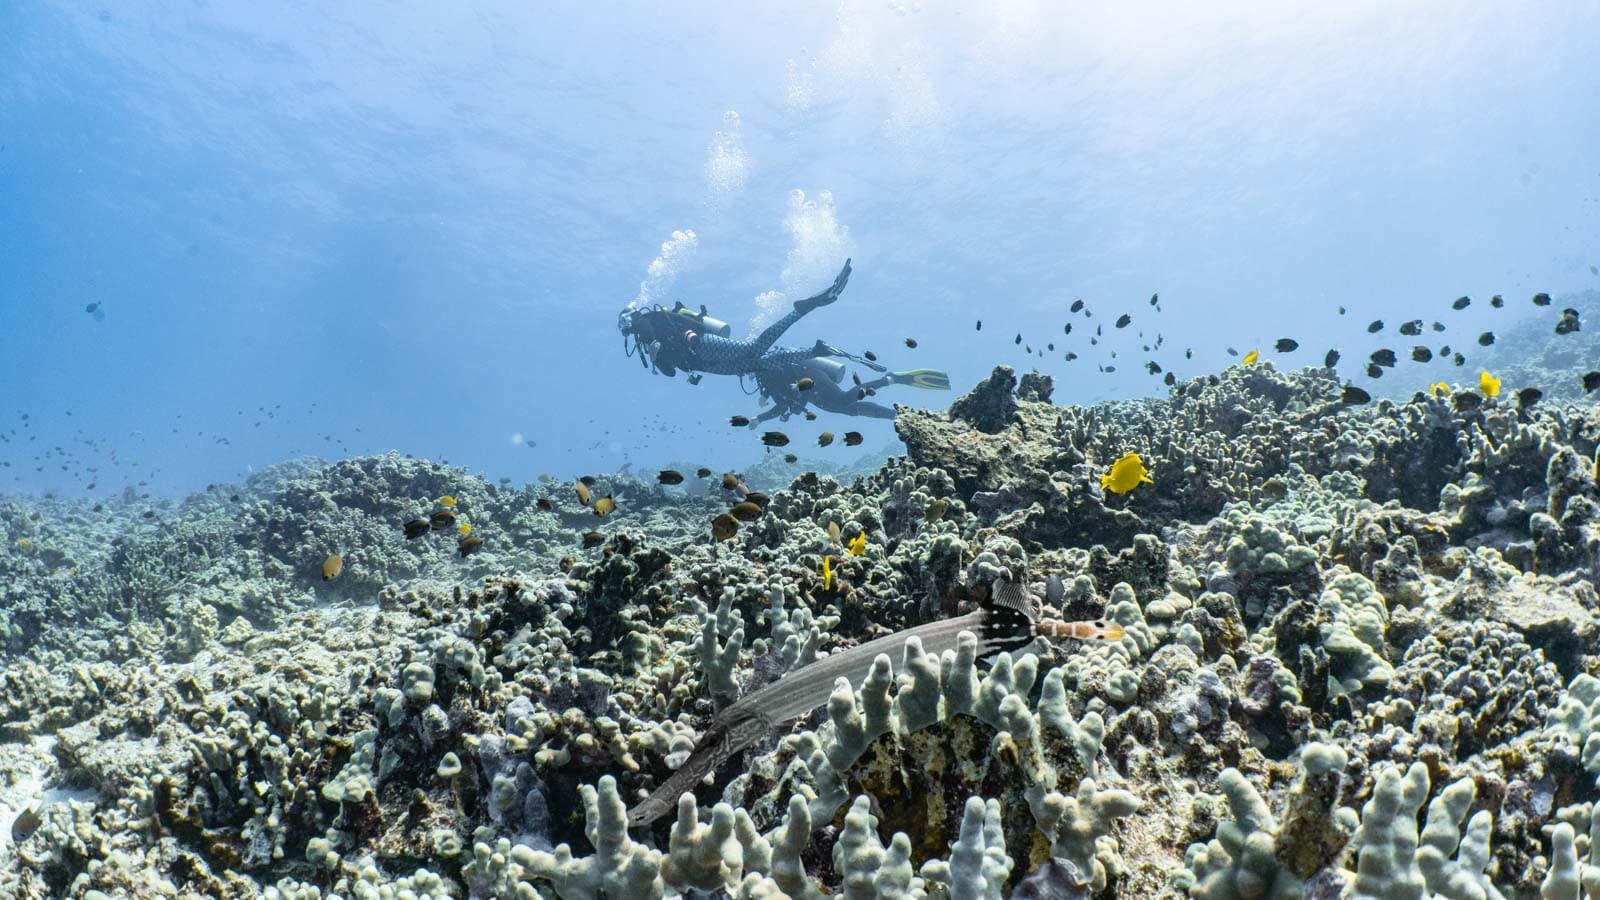 Scuba-Diving-Hawaii-Kona-Honu-Divers-23